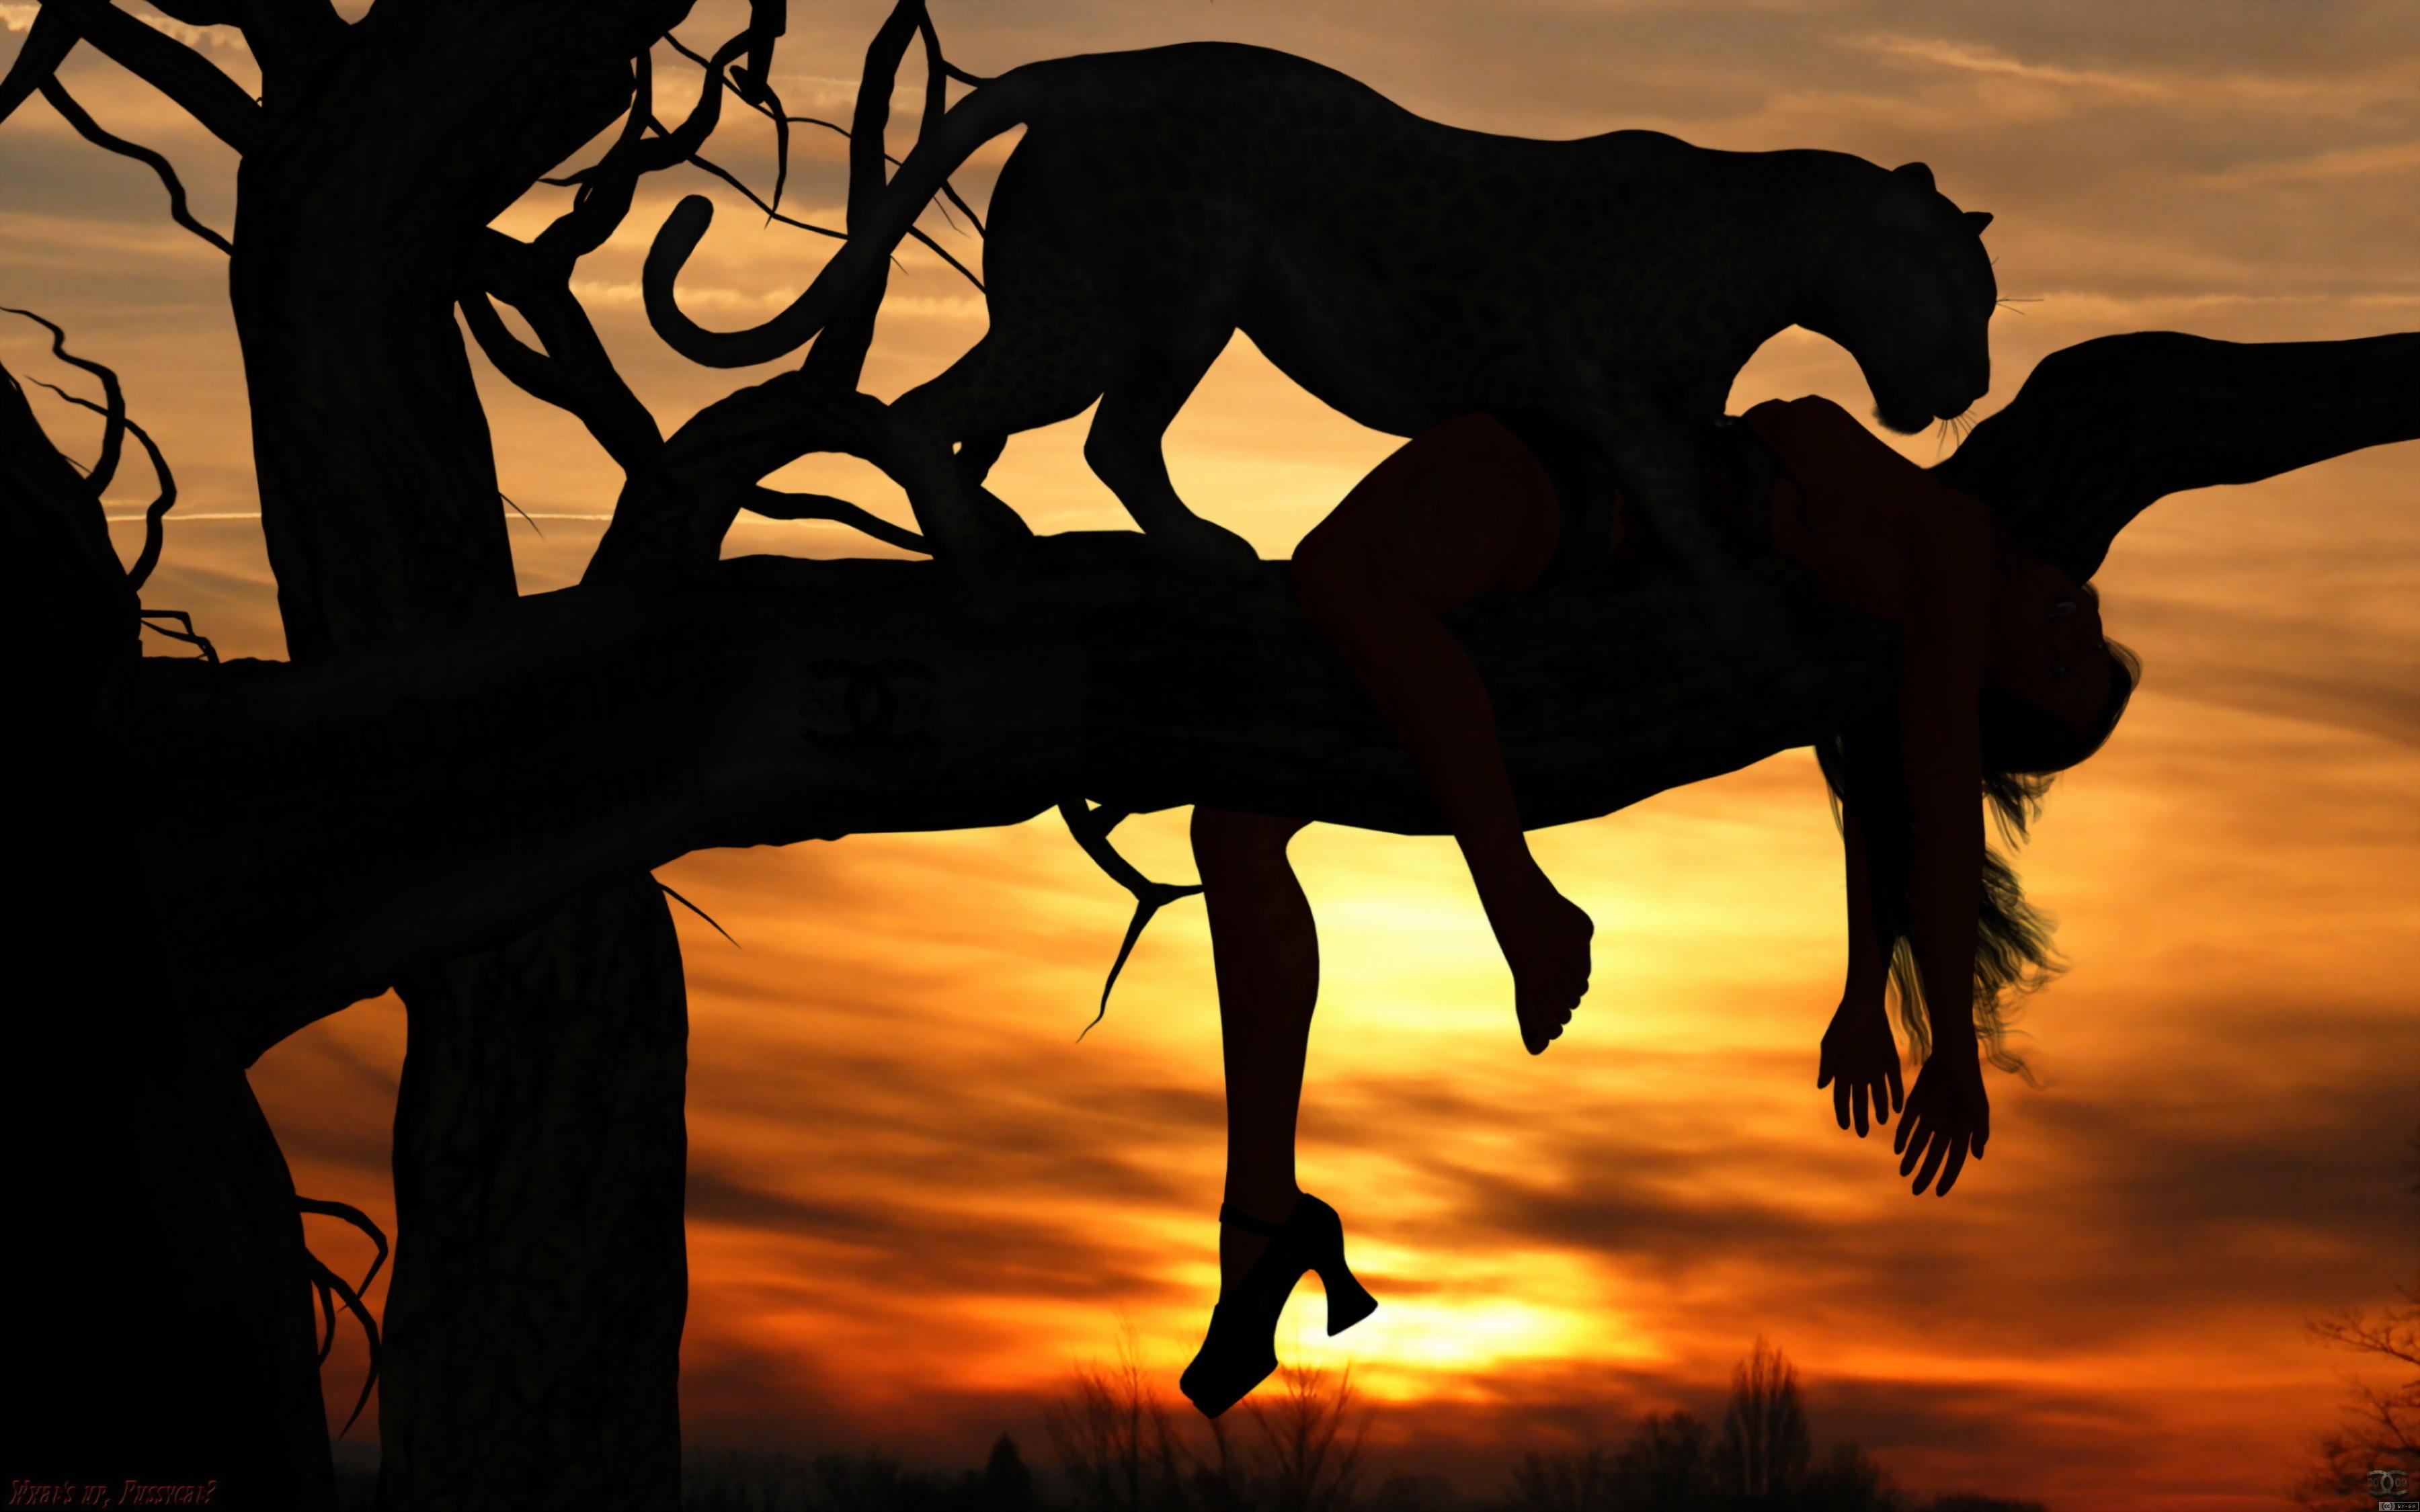 Hd wallpaper elephant - African Wallpapers Wallpapersafari